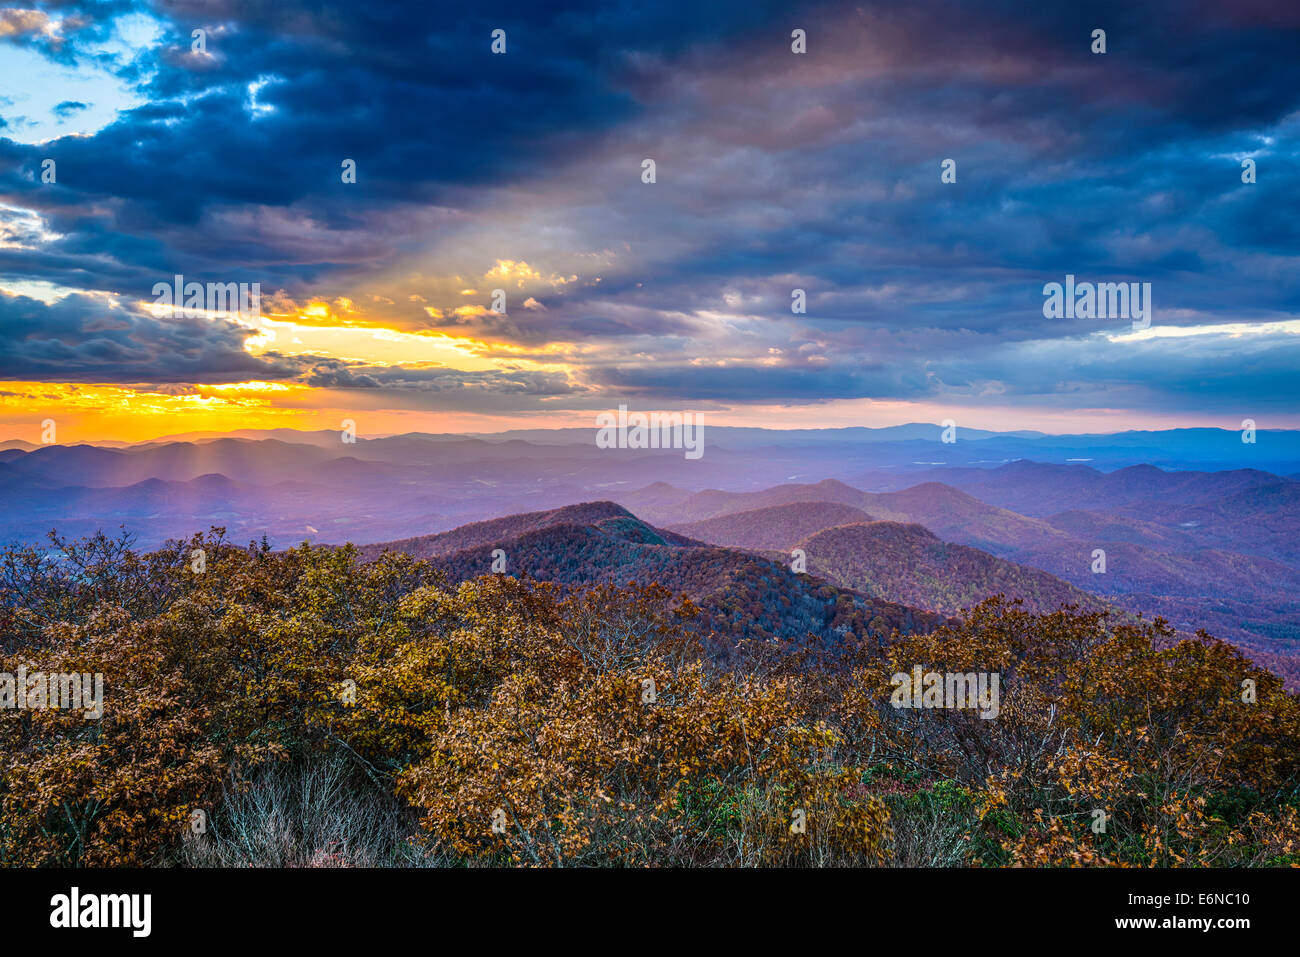 Blue Ridge Mountains in North Georgia, USA in der Herbstsaison bei Sonnenuntergang. Stockfoto